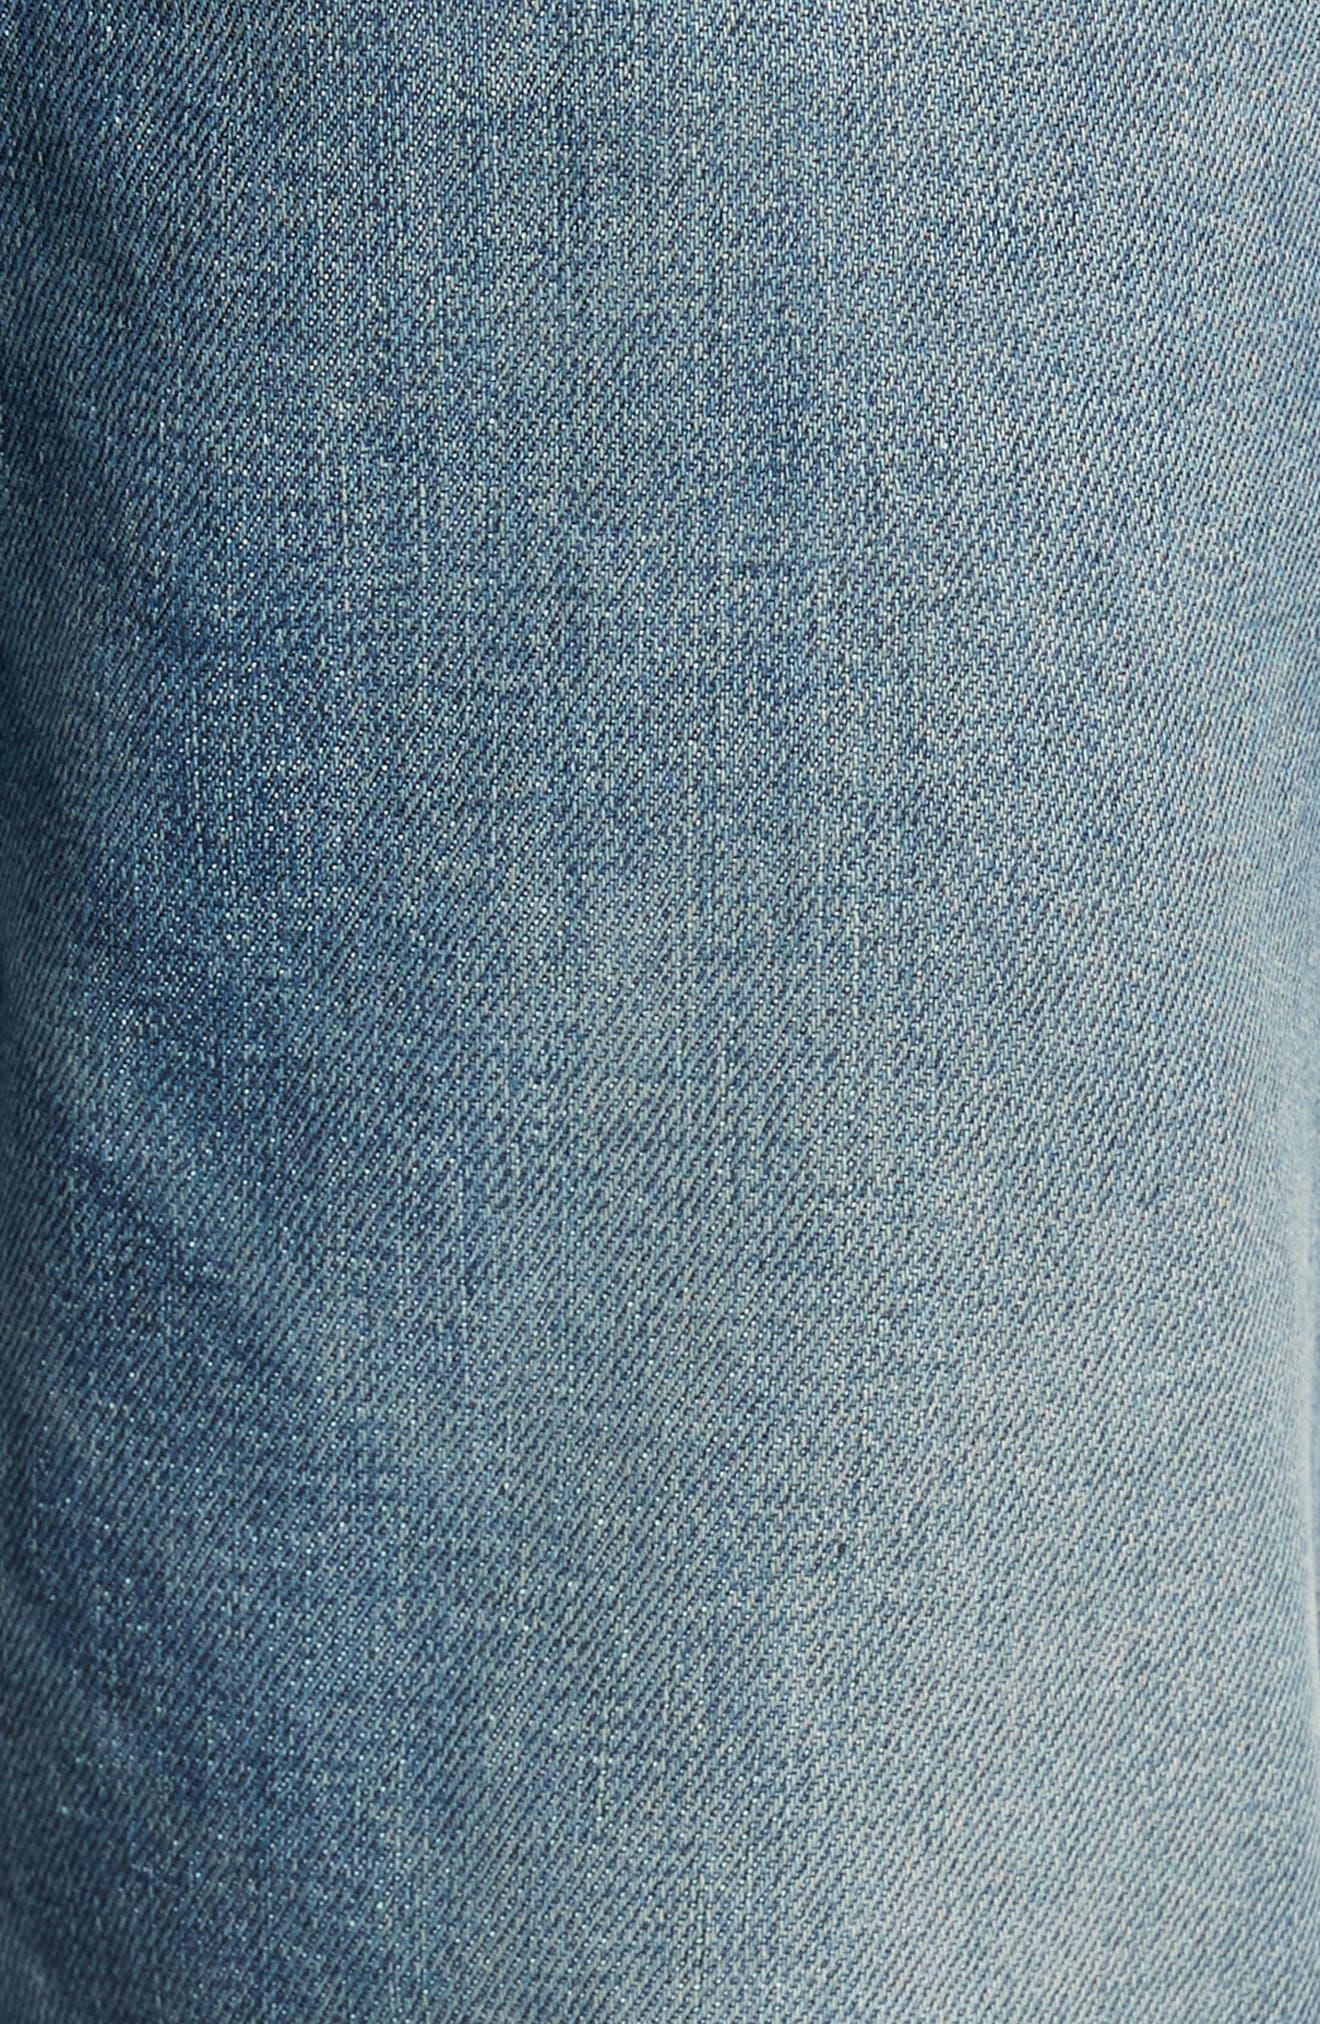 Alternate Image 5  - Hudson Jeans Blake Slim Fit Jeans (Withstand)